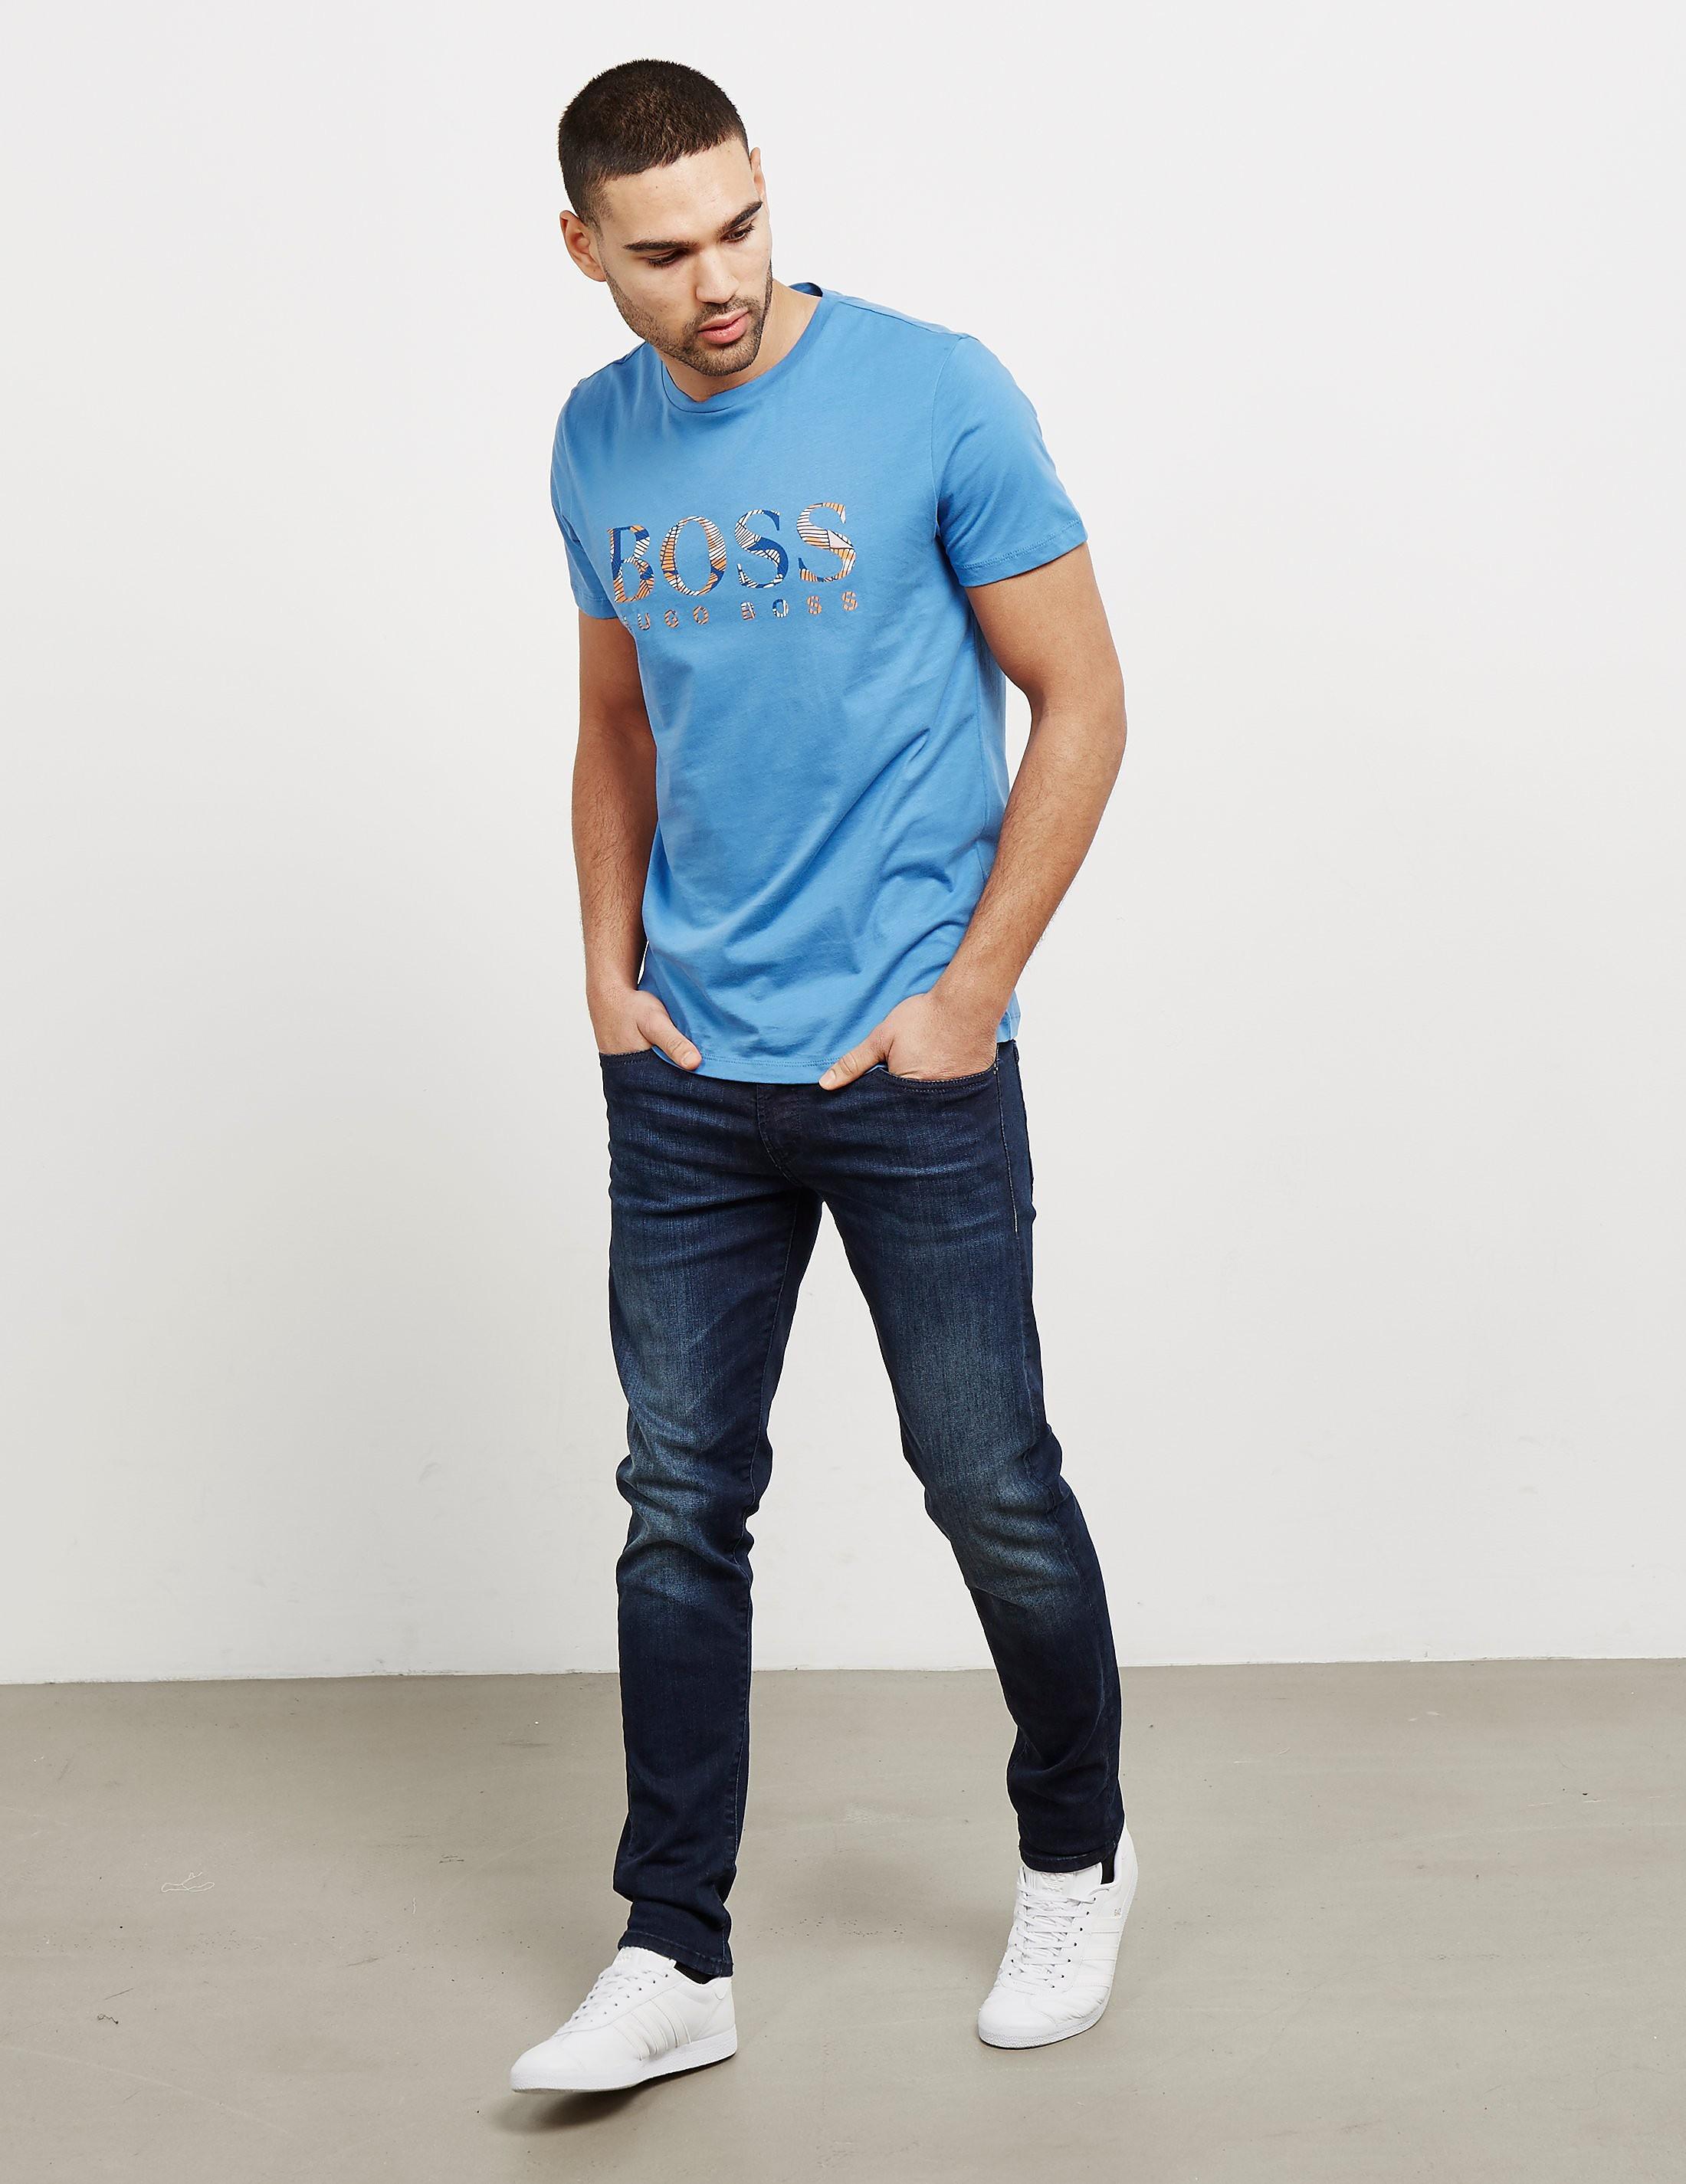 BOSS Tauno7 Palm Short Sleeve T-Shirt